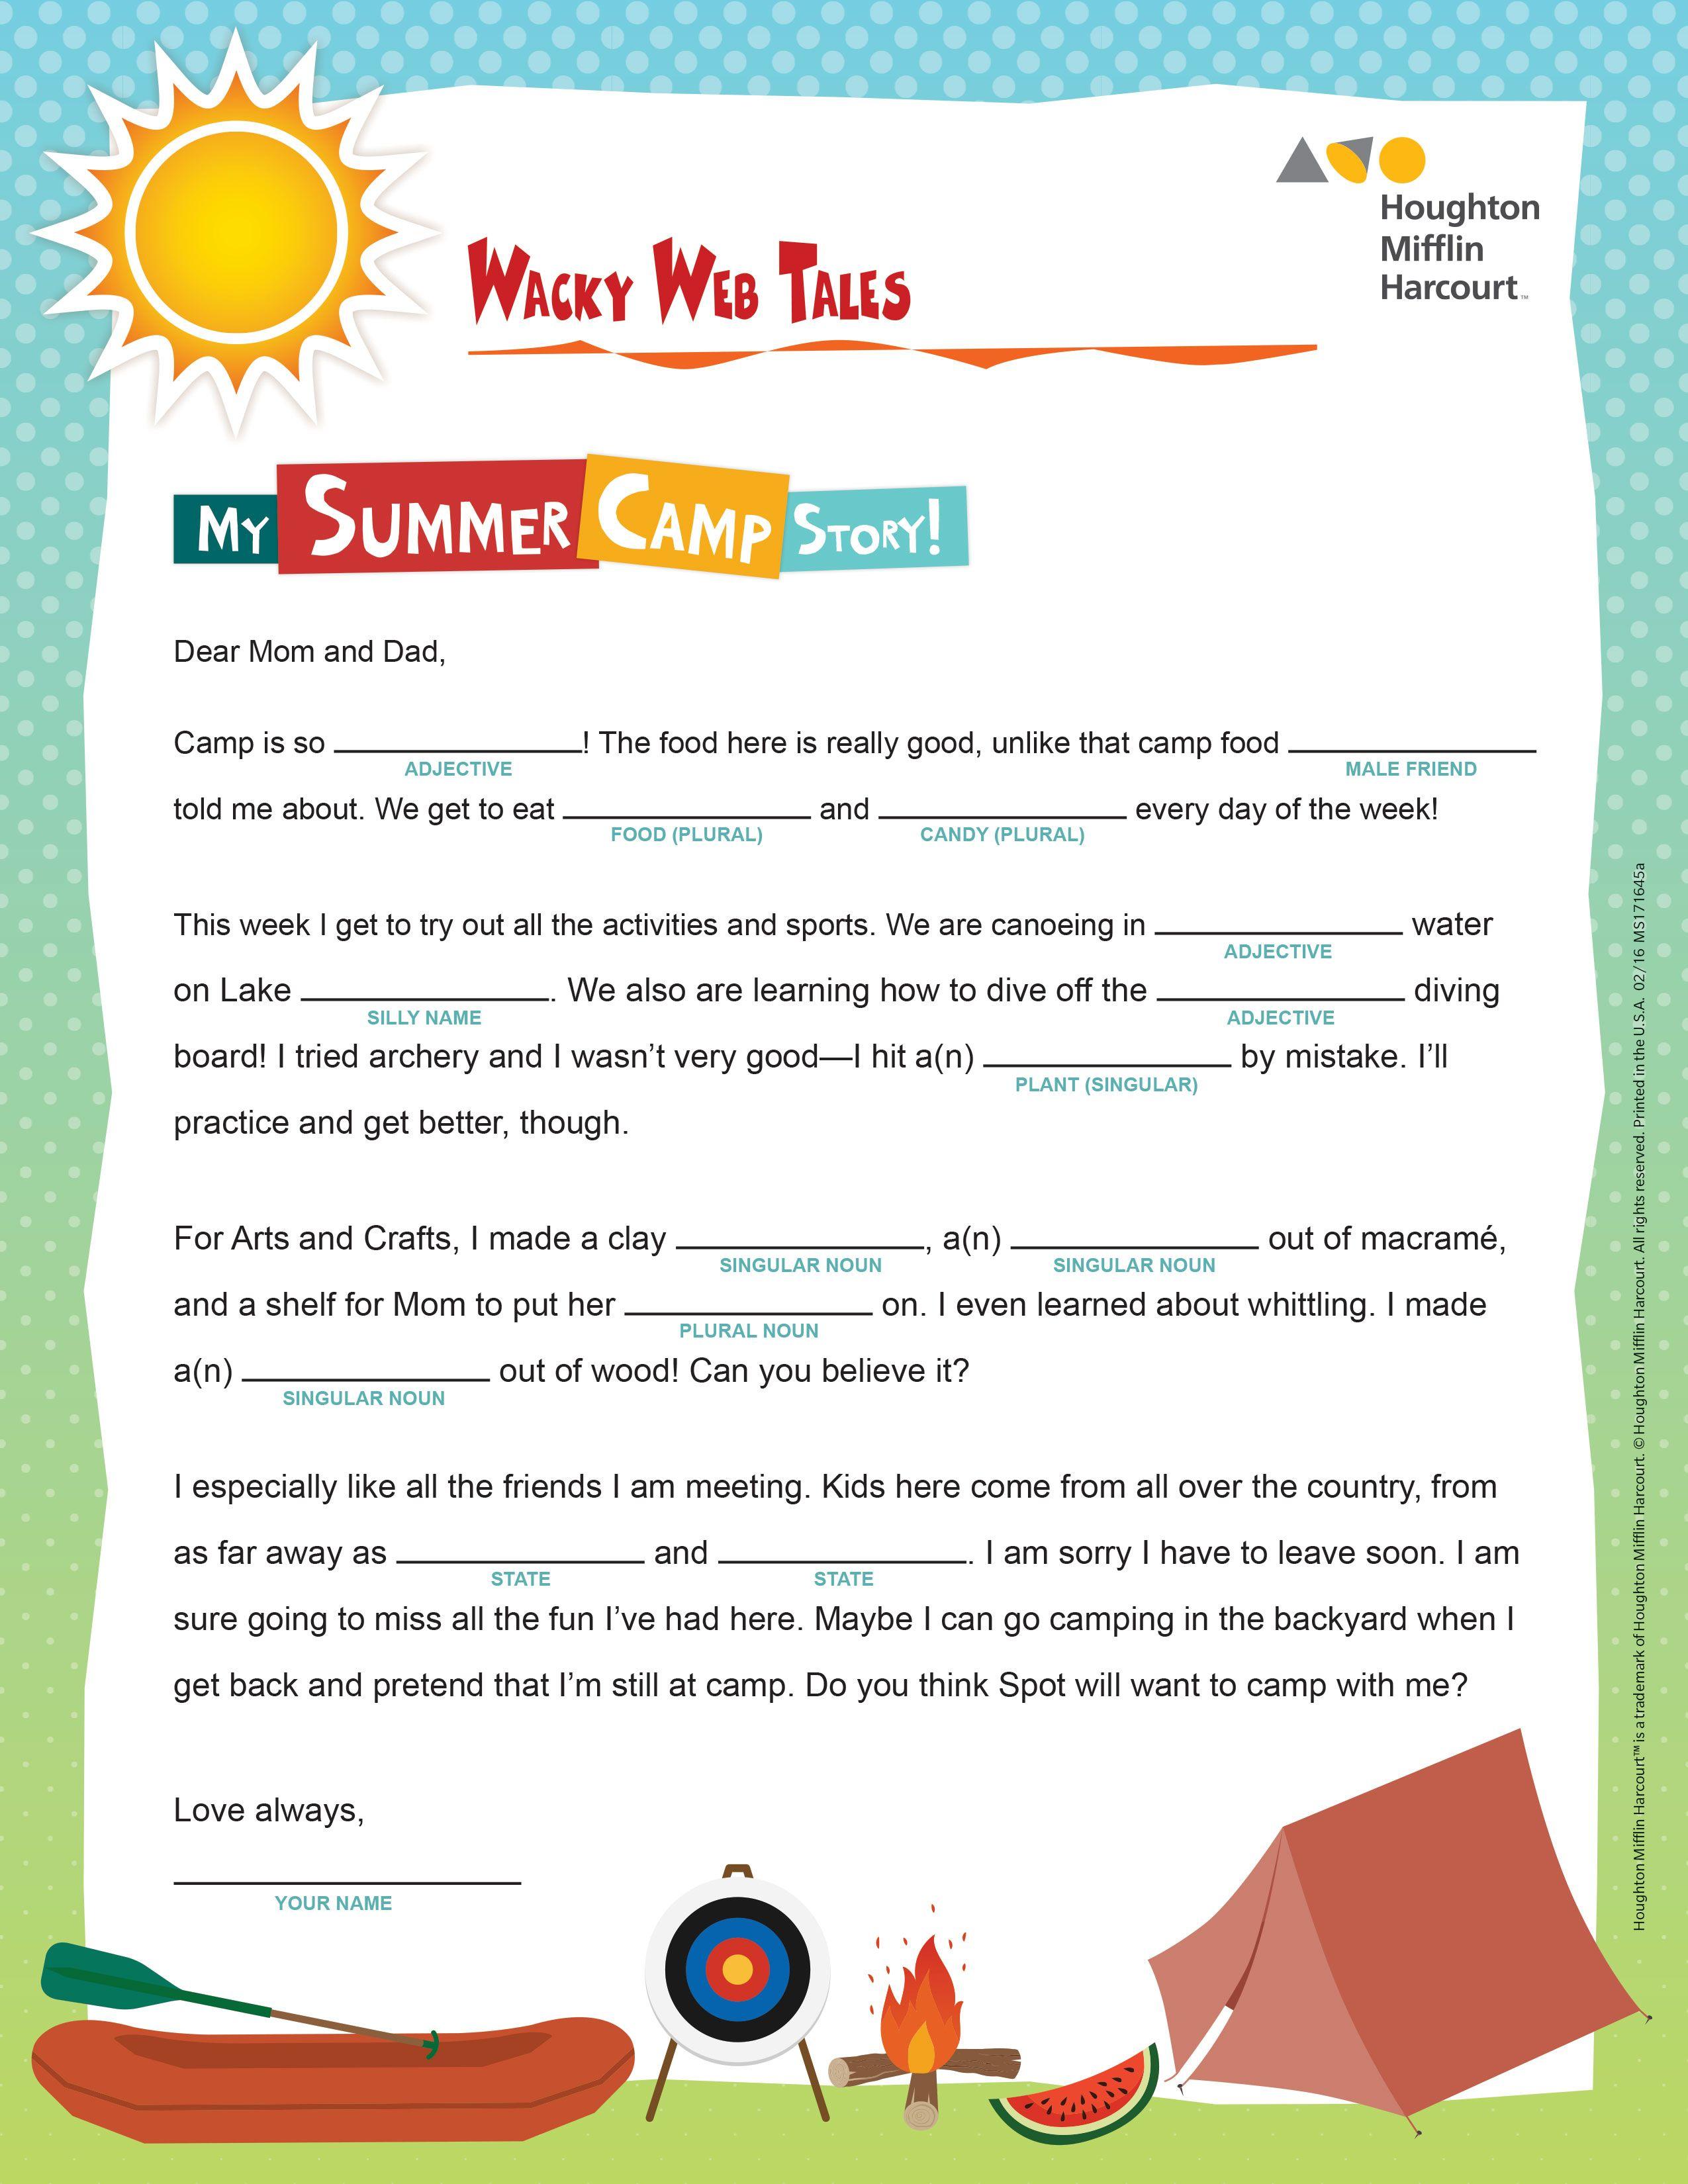 Print This Fun Summer Themed Worksheet To Reinforce Parts Of Speech For More Summer School Reso Summer School Curriculum Summer School Programs Summer School [ 3300 x 2550 Pixel ]